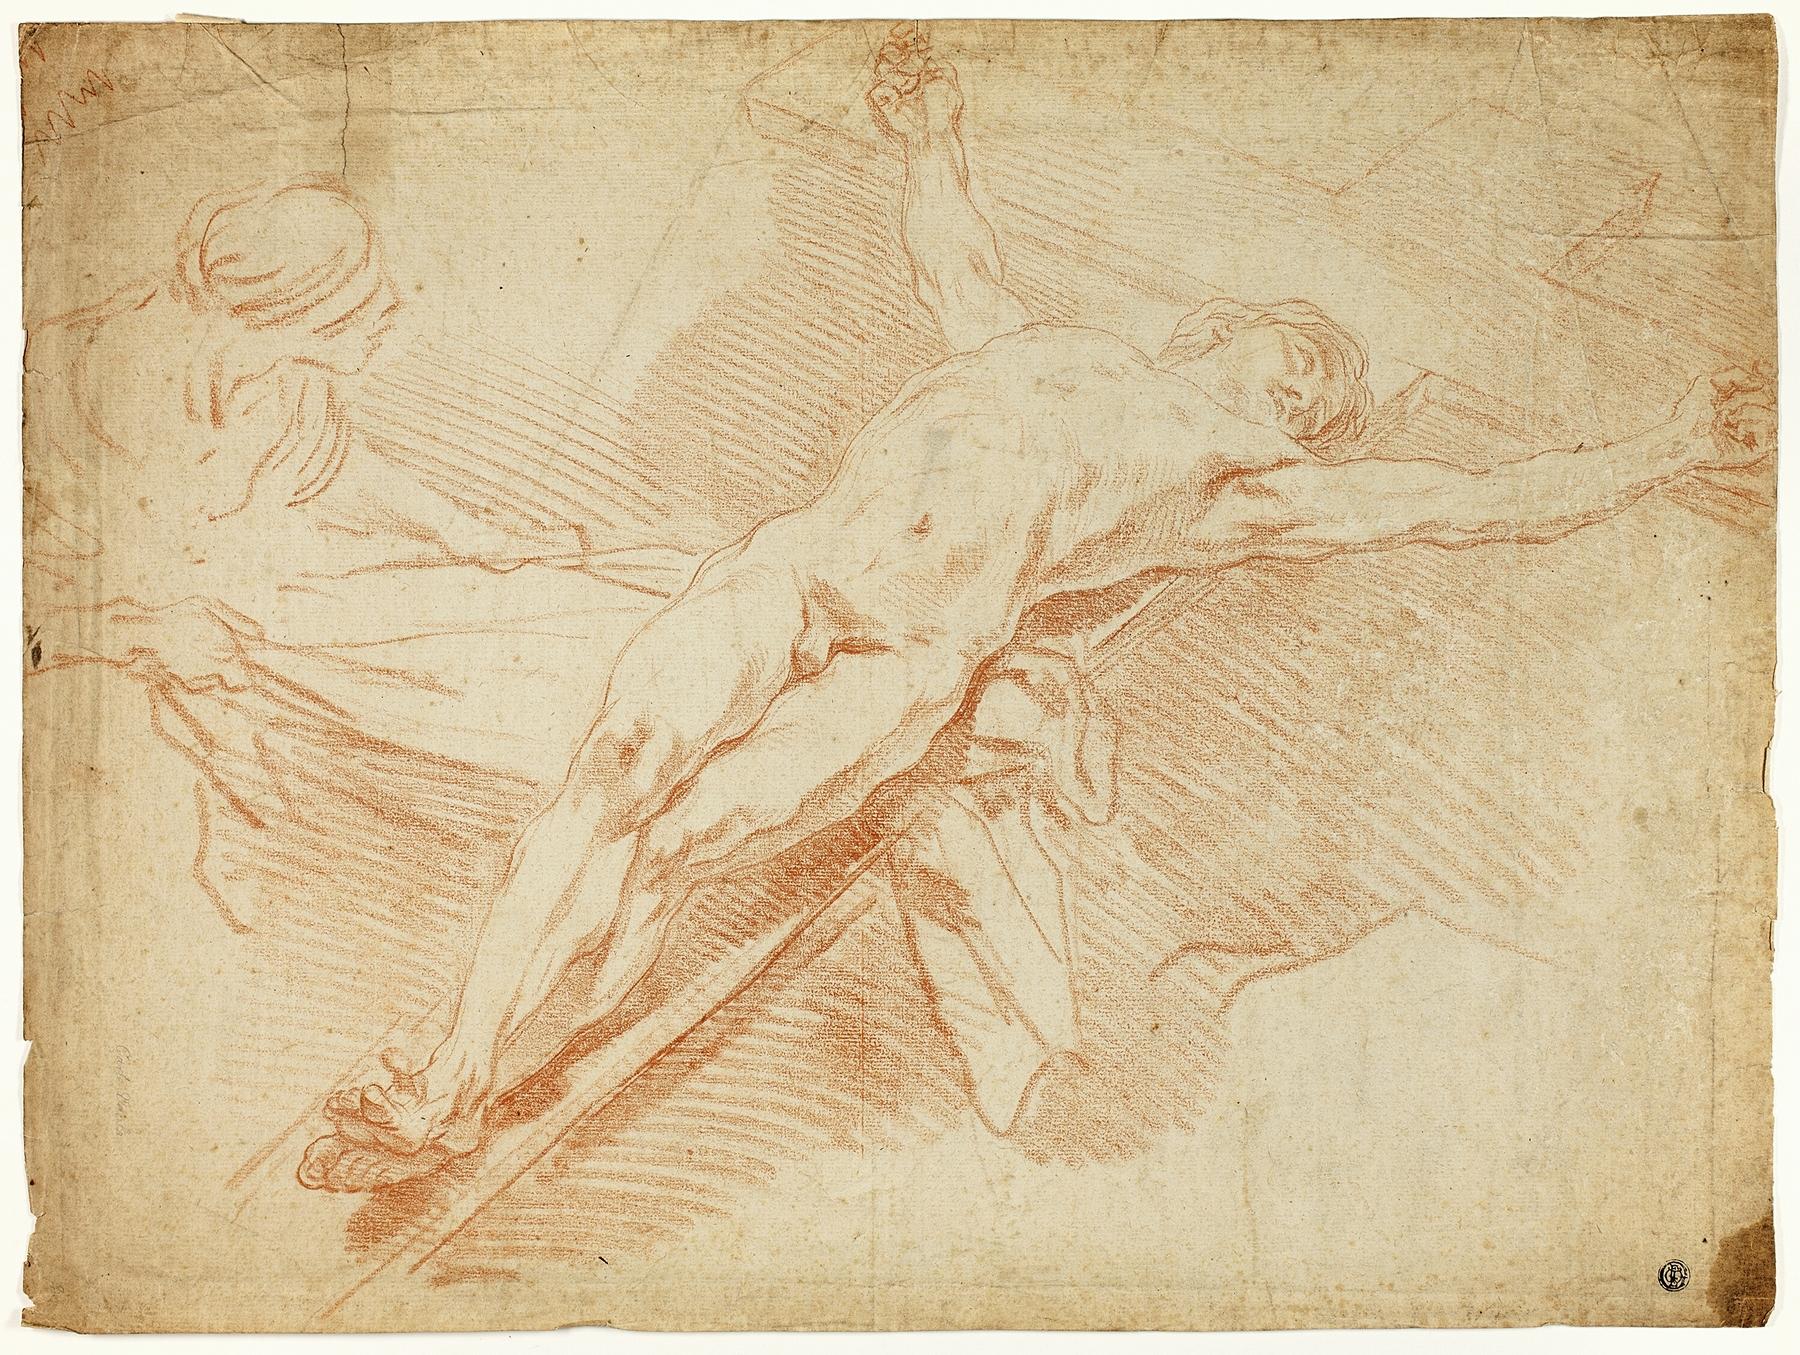 Charles-André van Loo - Christ on the Cross